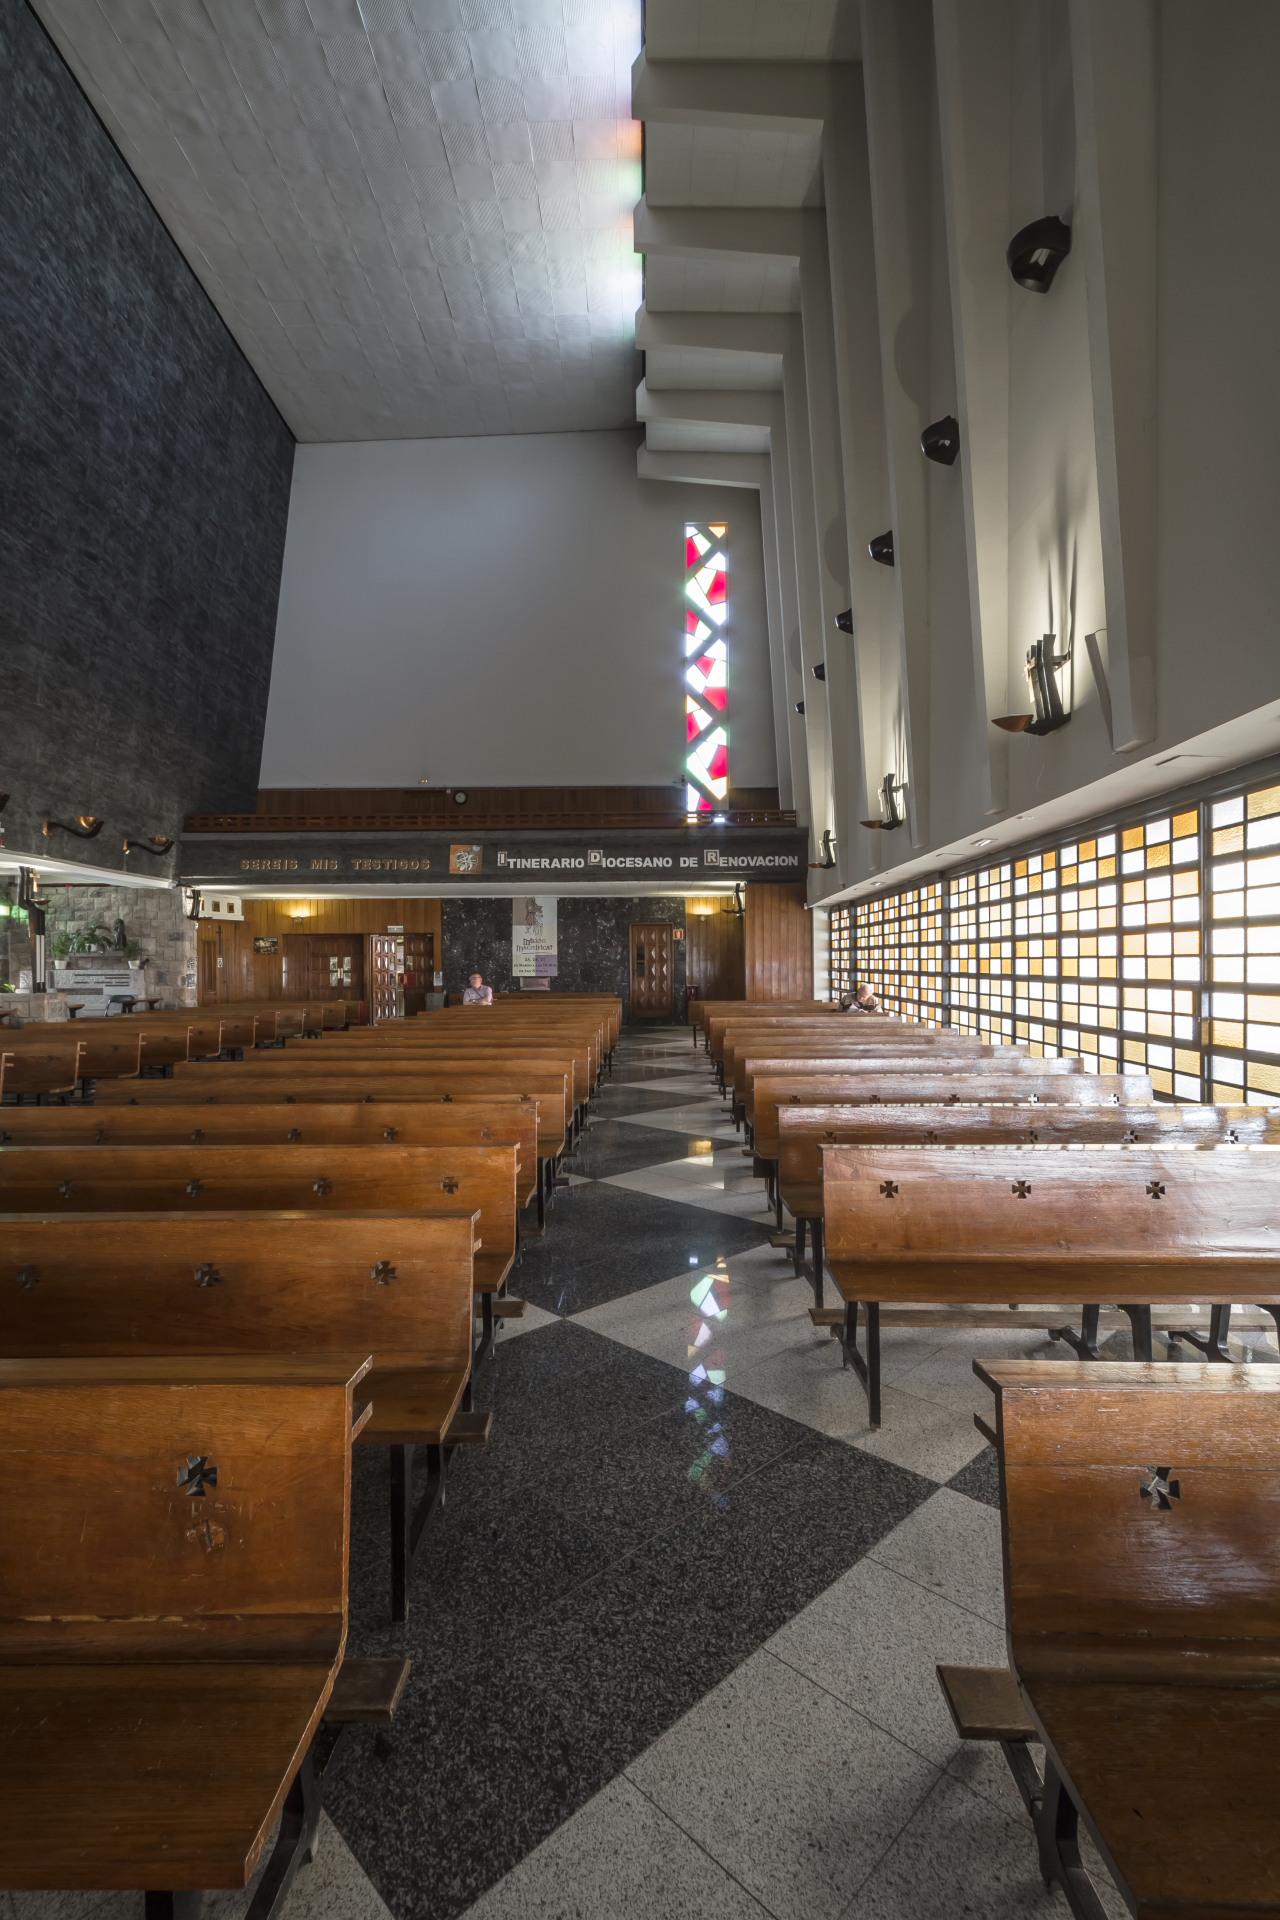 fotografia-arquitectura-valencia-gandia-german-cabo-iglesia-san-nicolas-torroja (7)